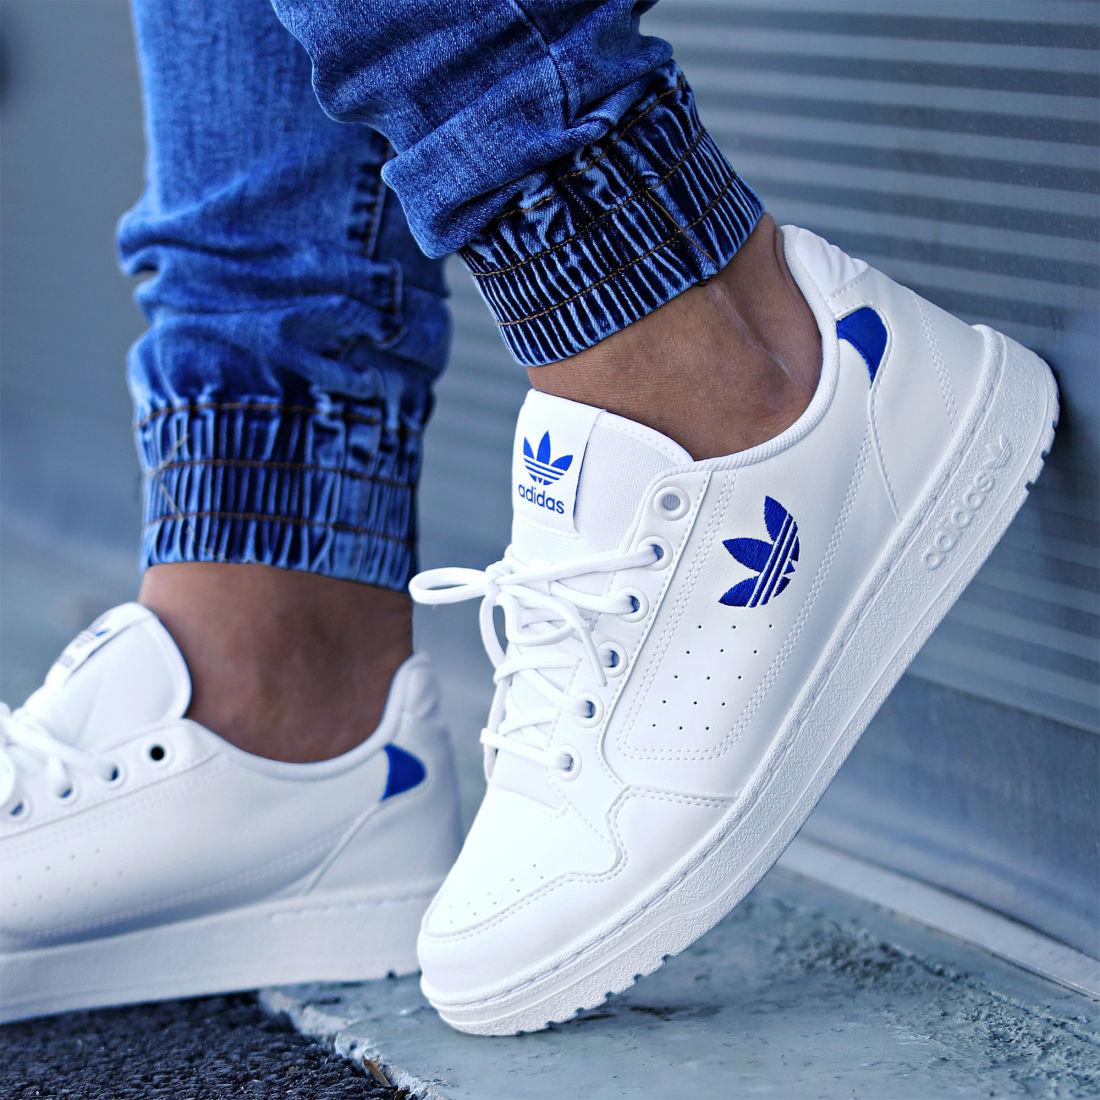 adidas - Baskets NY 90 FZ2247 Footwear White Royal Blue ...